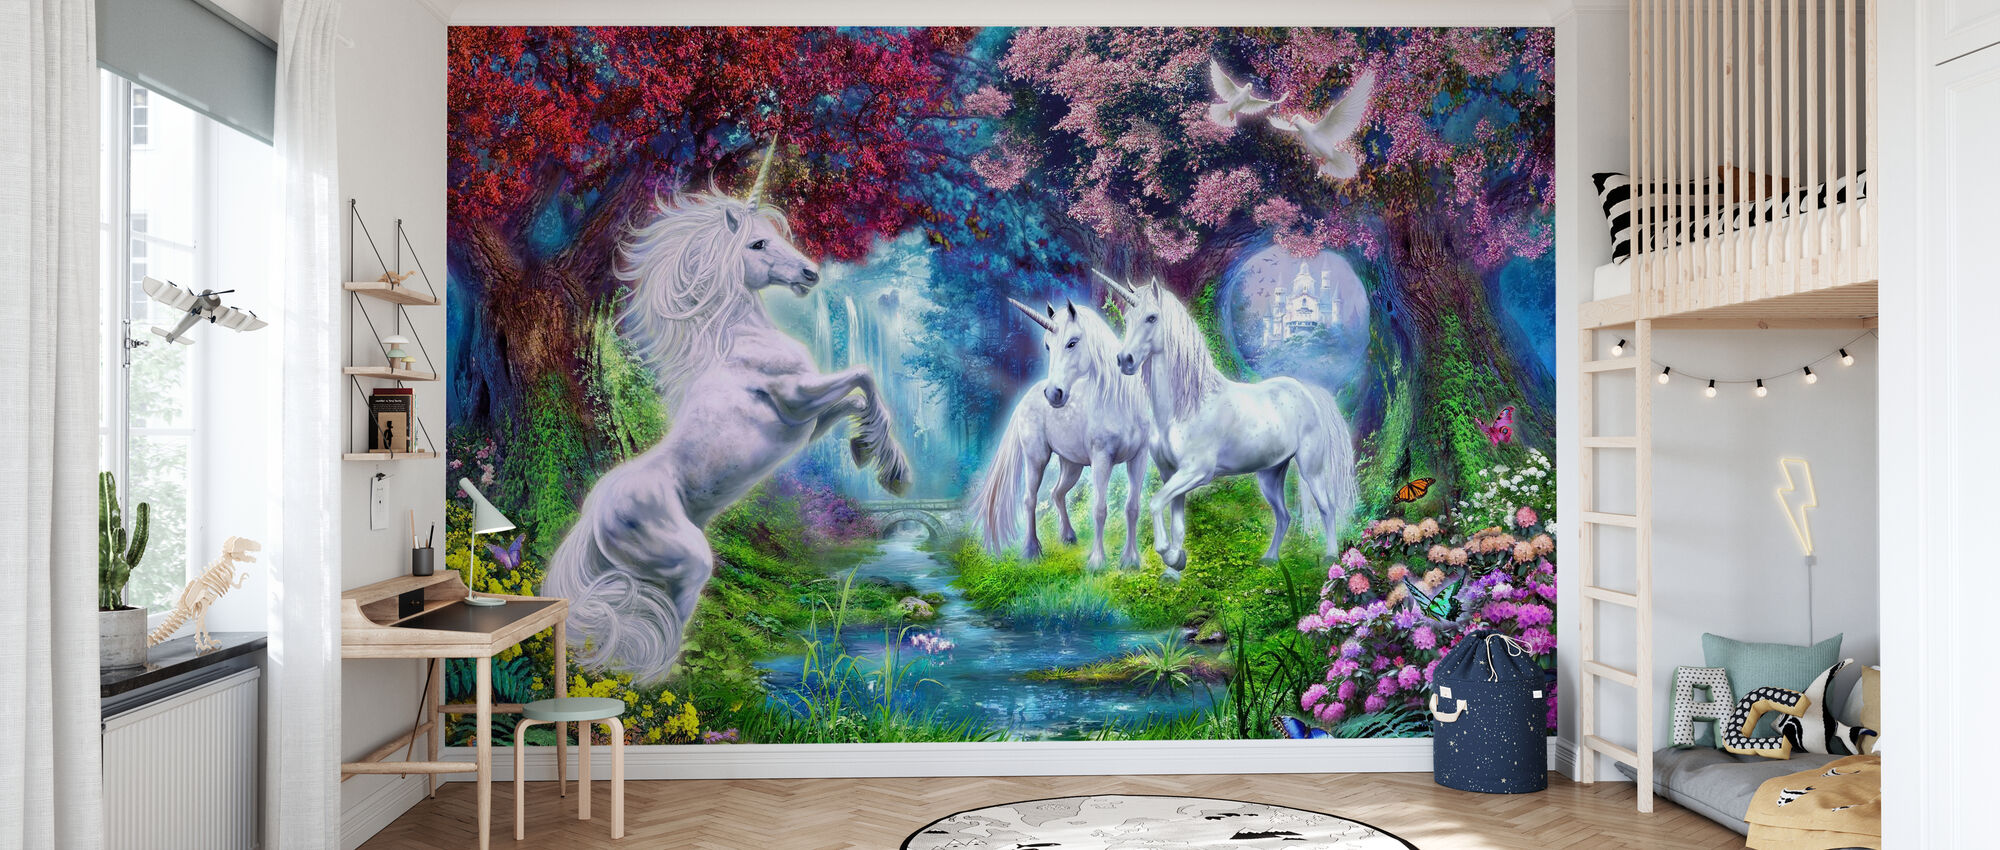 Unicorn Rendezvous - Wallpaper - Kids Room